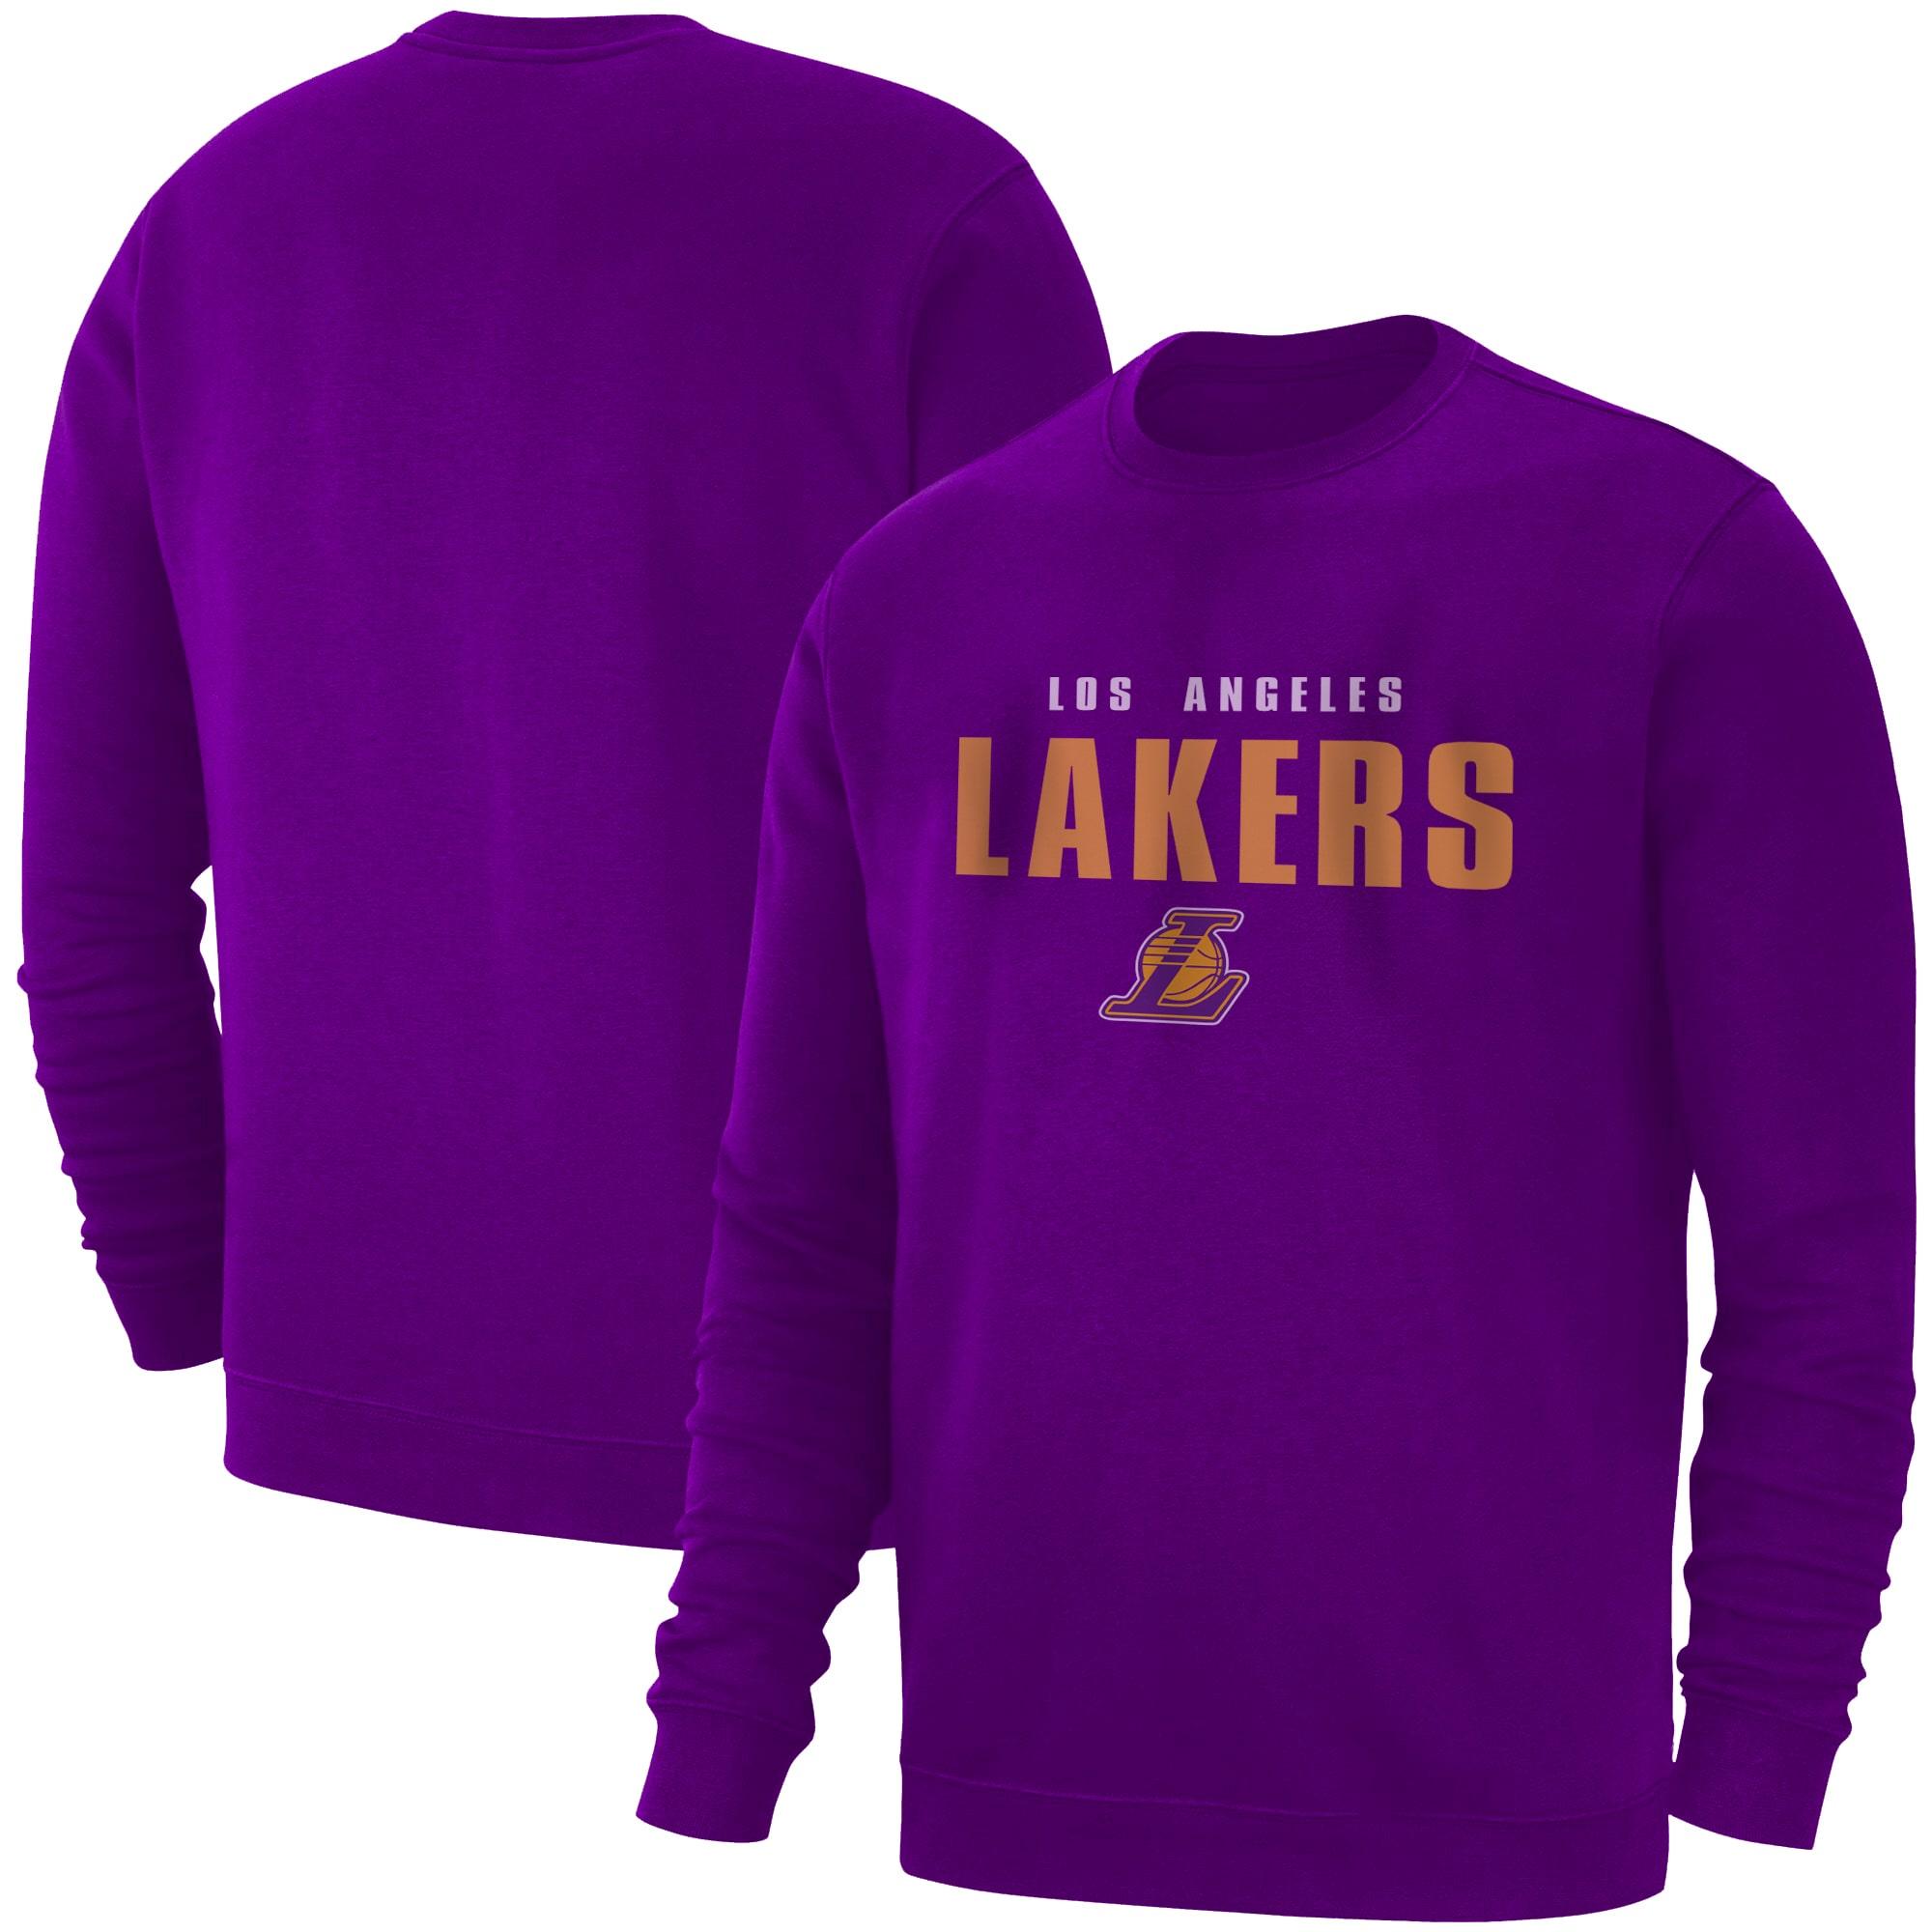 LA. Lakers Basic (BSC-PRP-NP-126-NBA-LAL-LAKERS.FLAT)